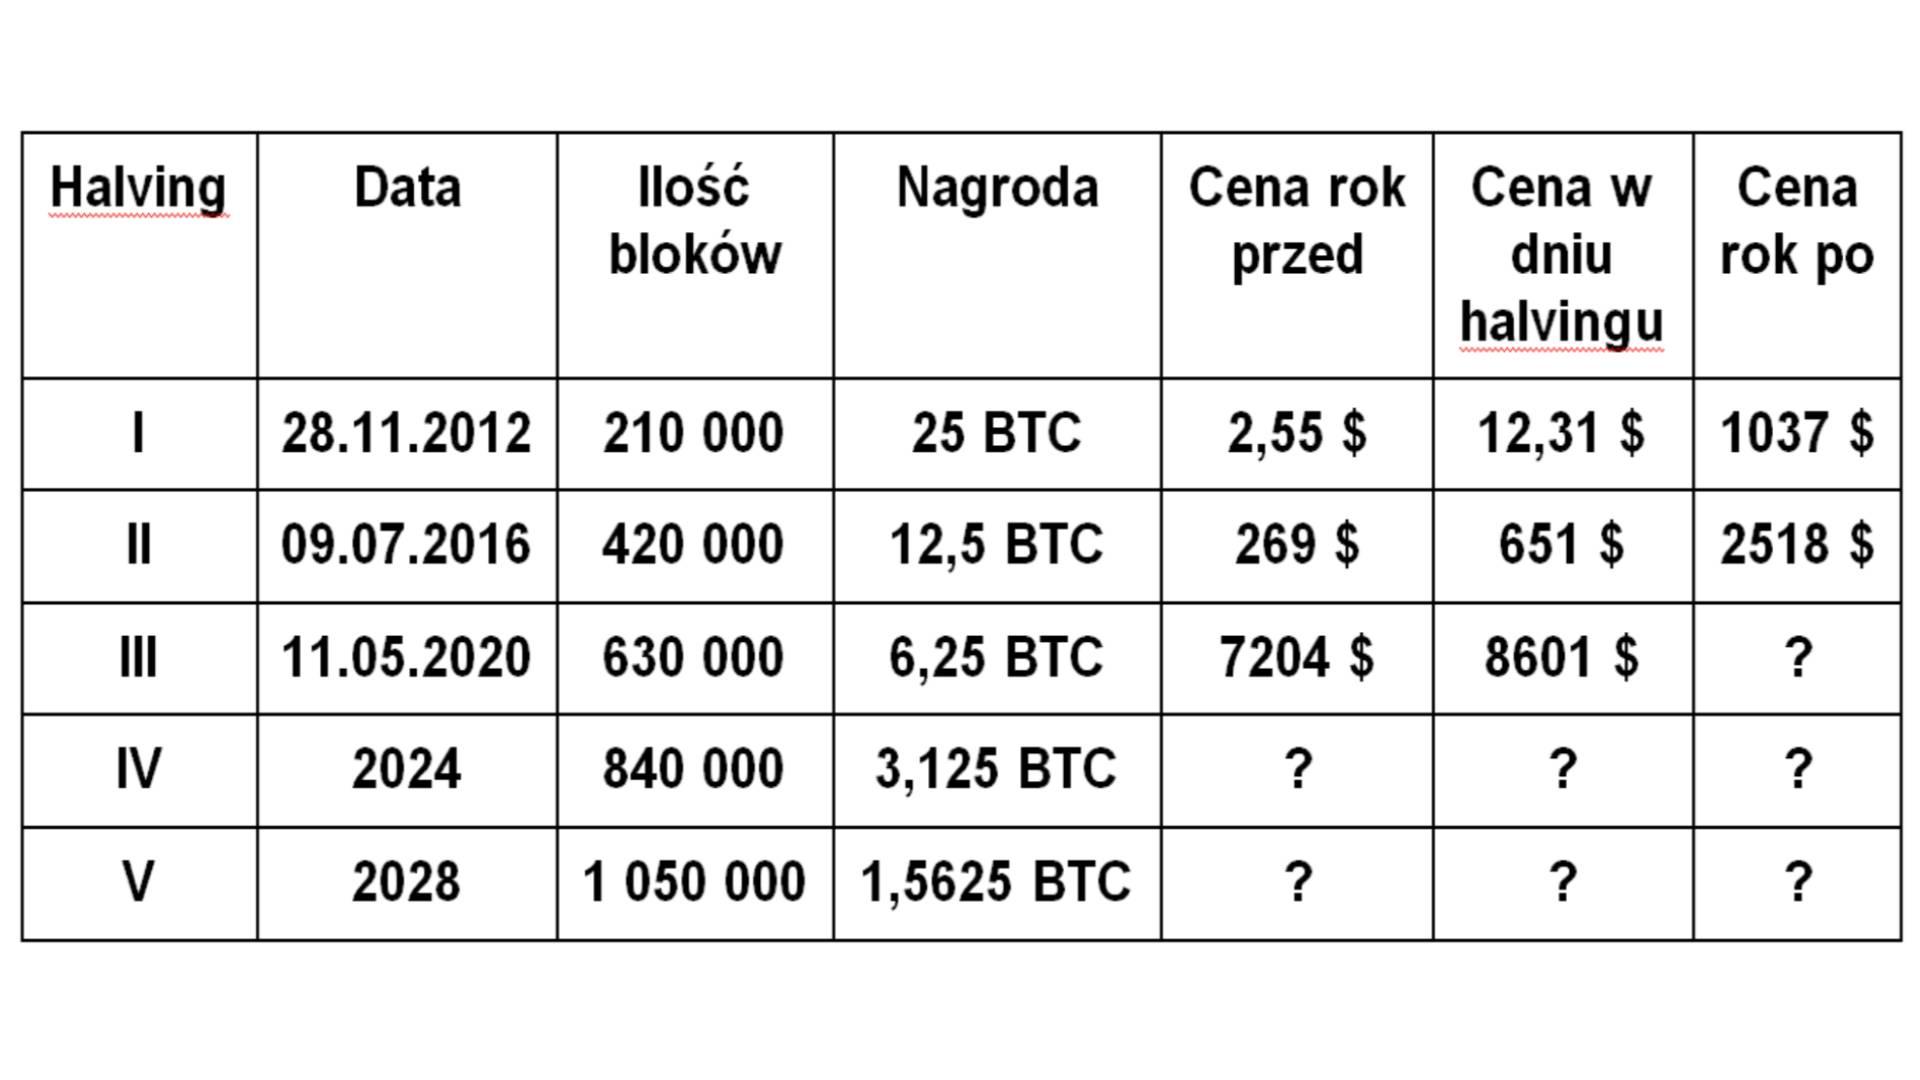 Kurs BTC w czasie halving Bitcoin